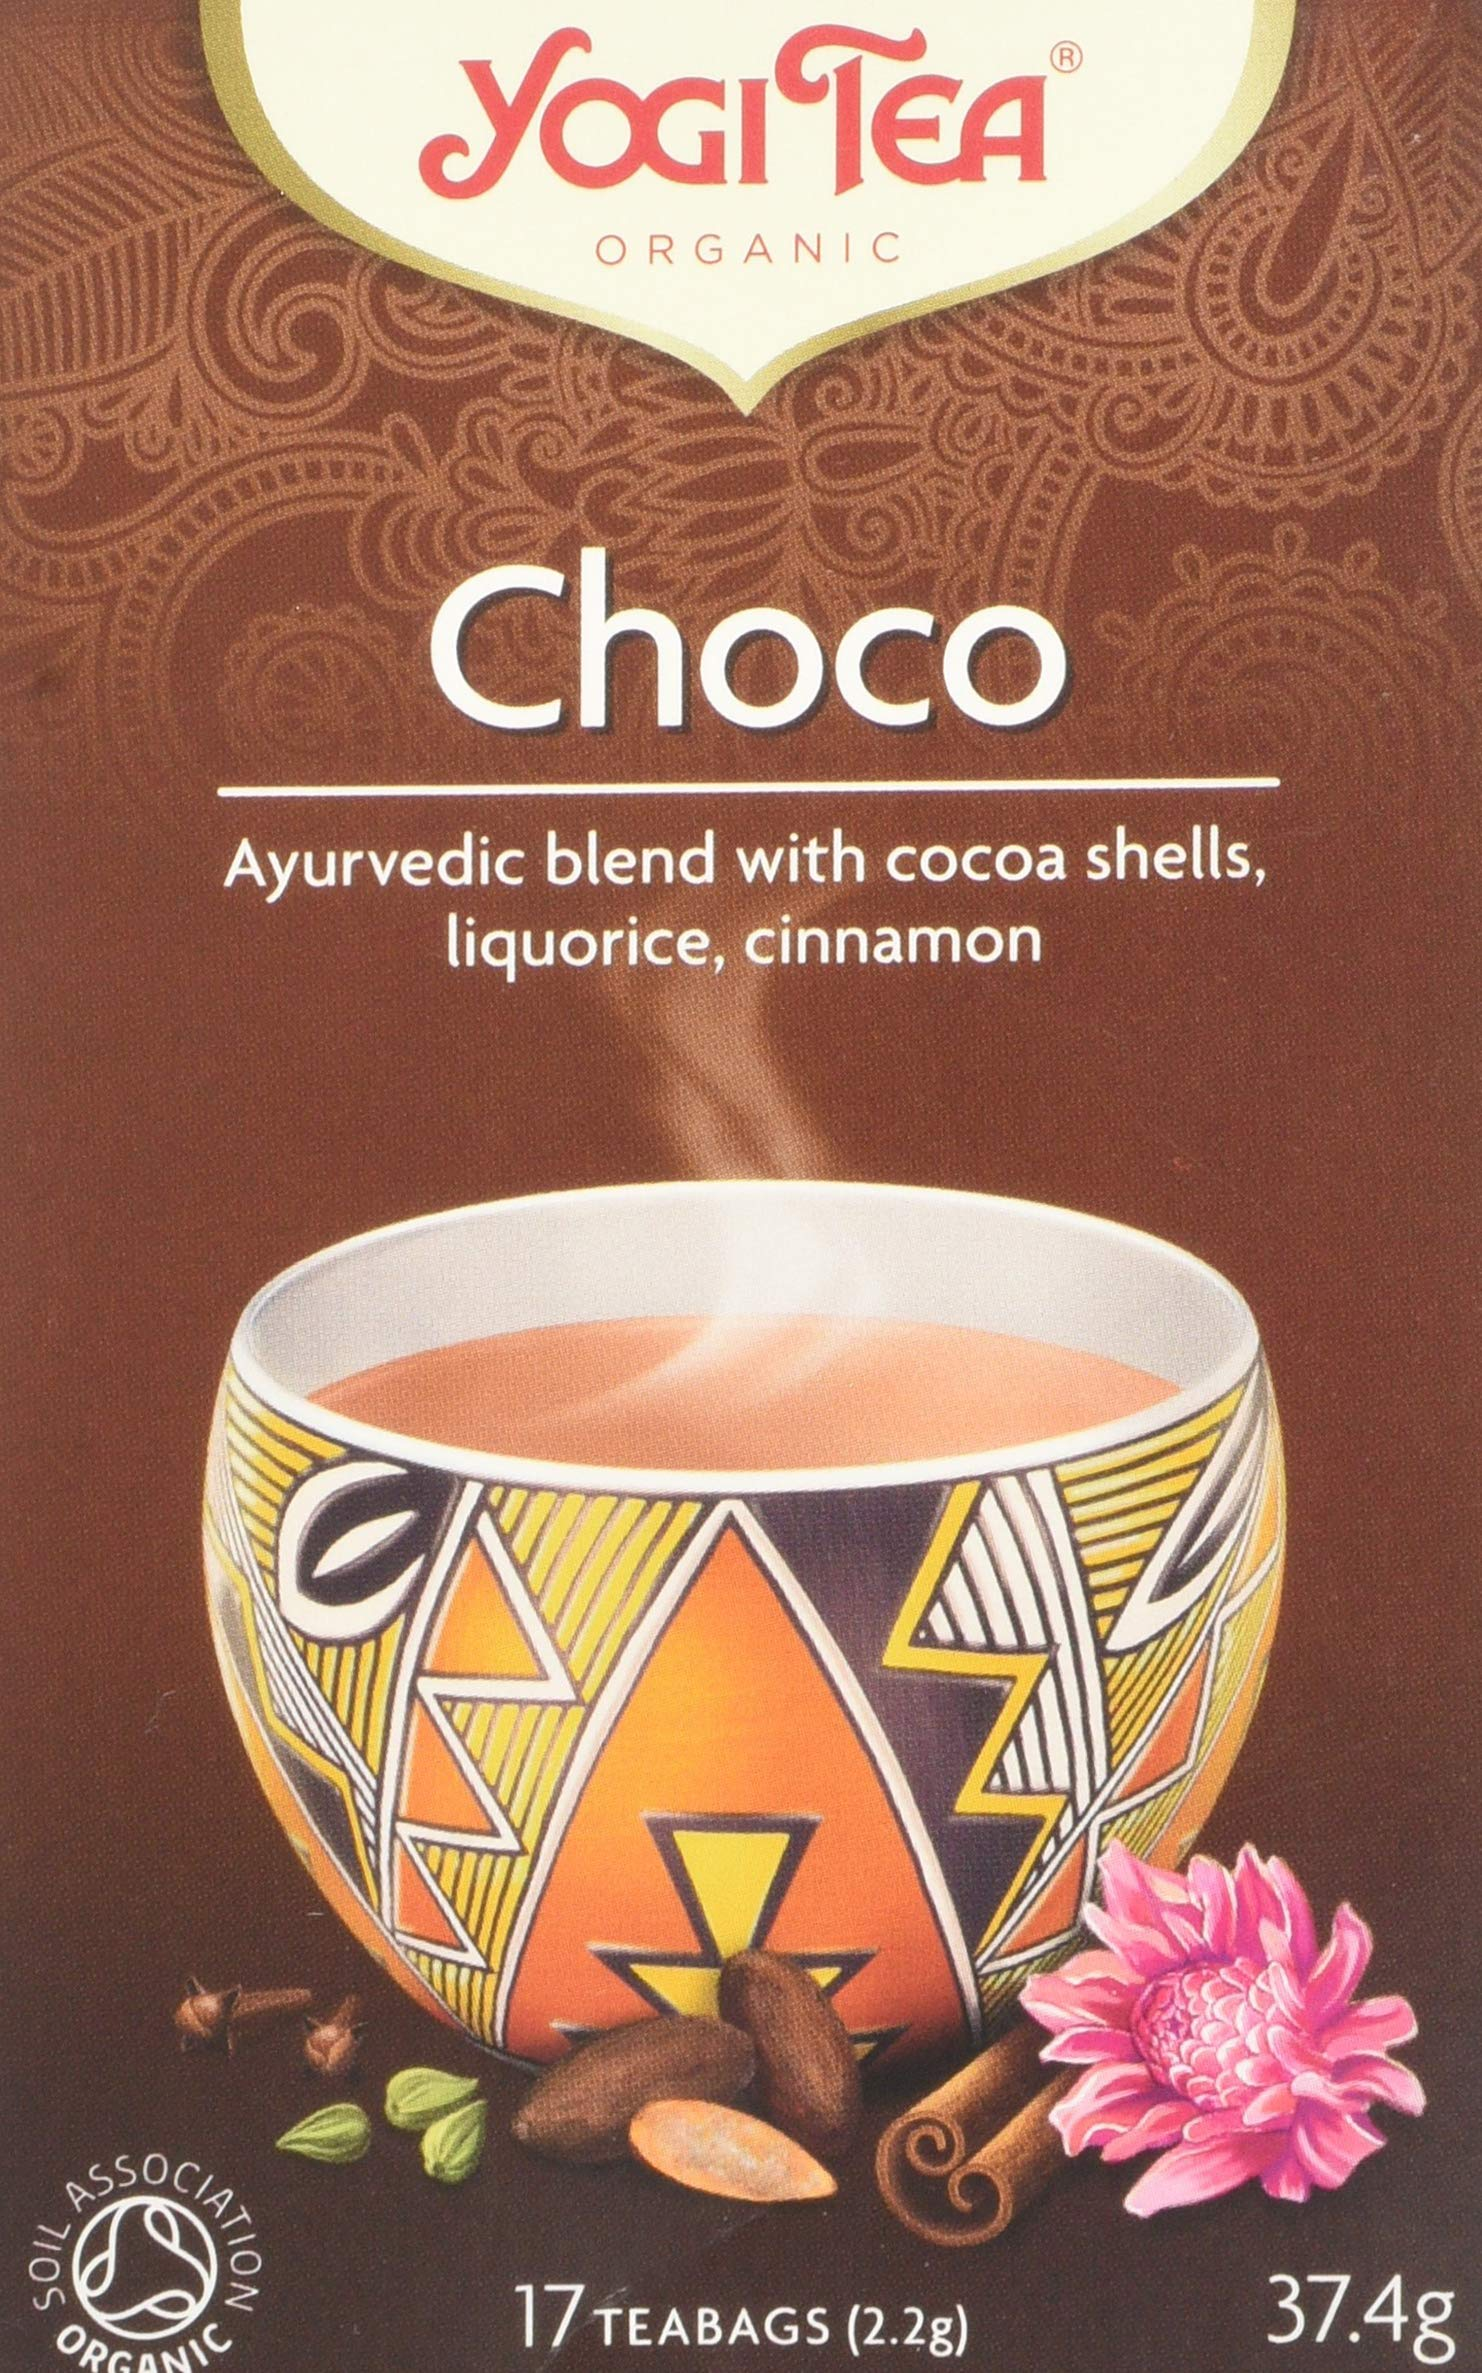 YOGI TEAS - AYURVEDIC Organic Fairtrade Choco Tea Bags 17bags (PACK OF 1)